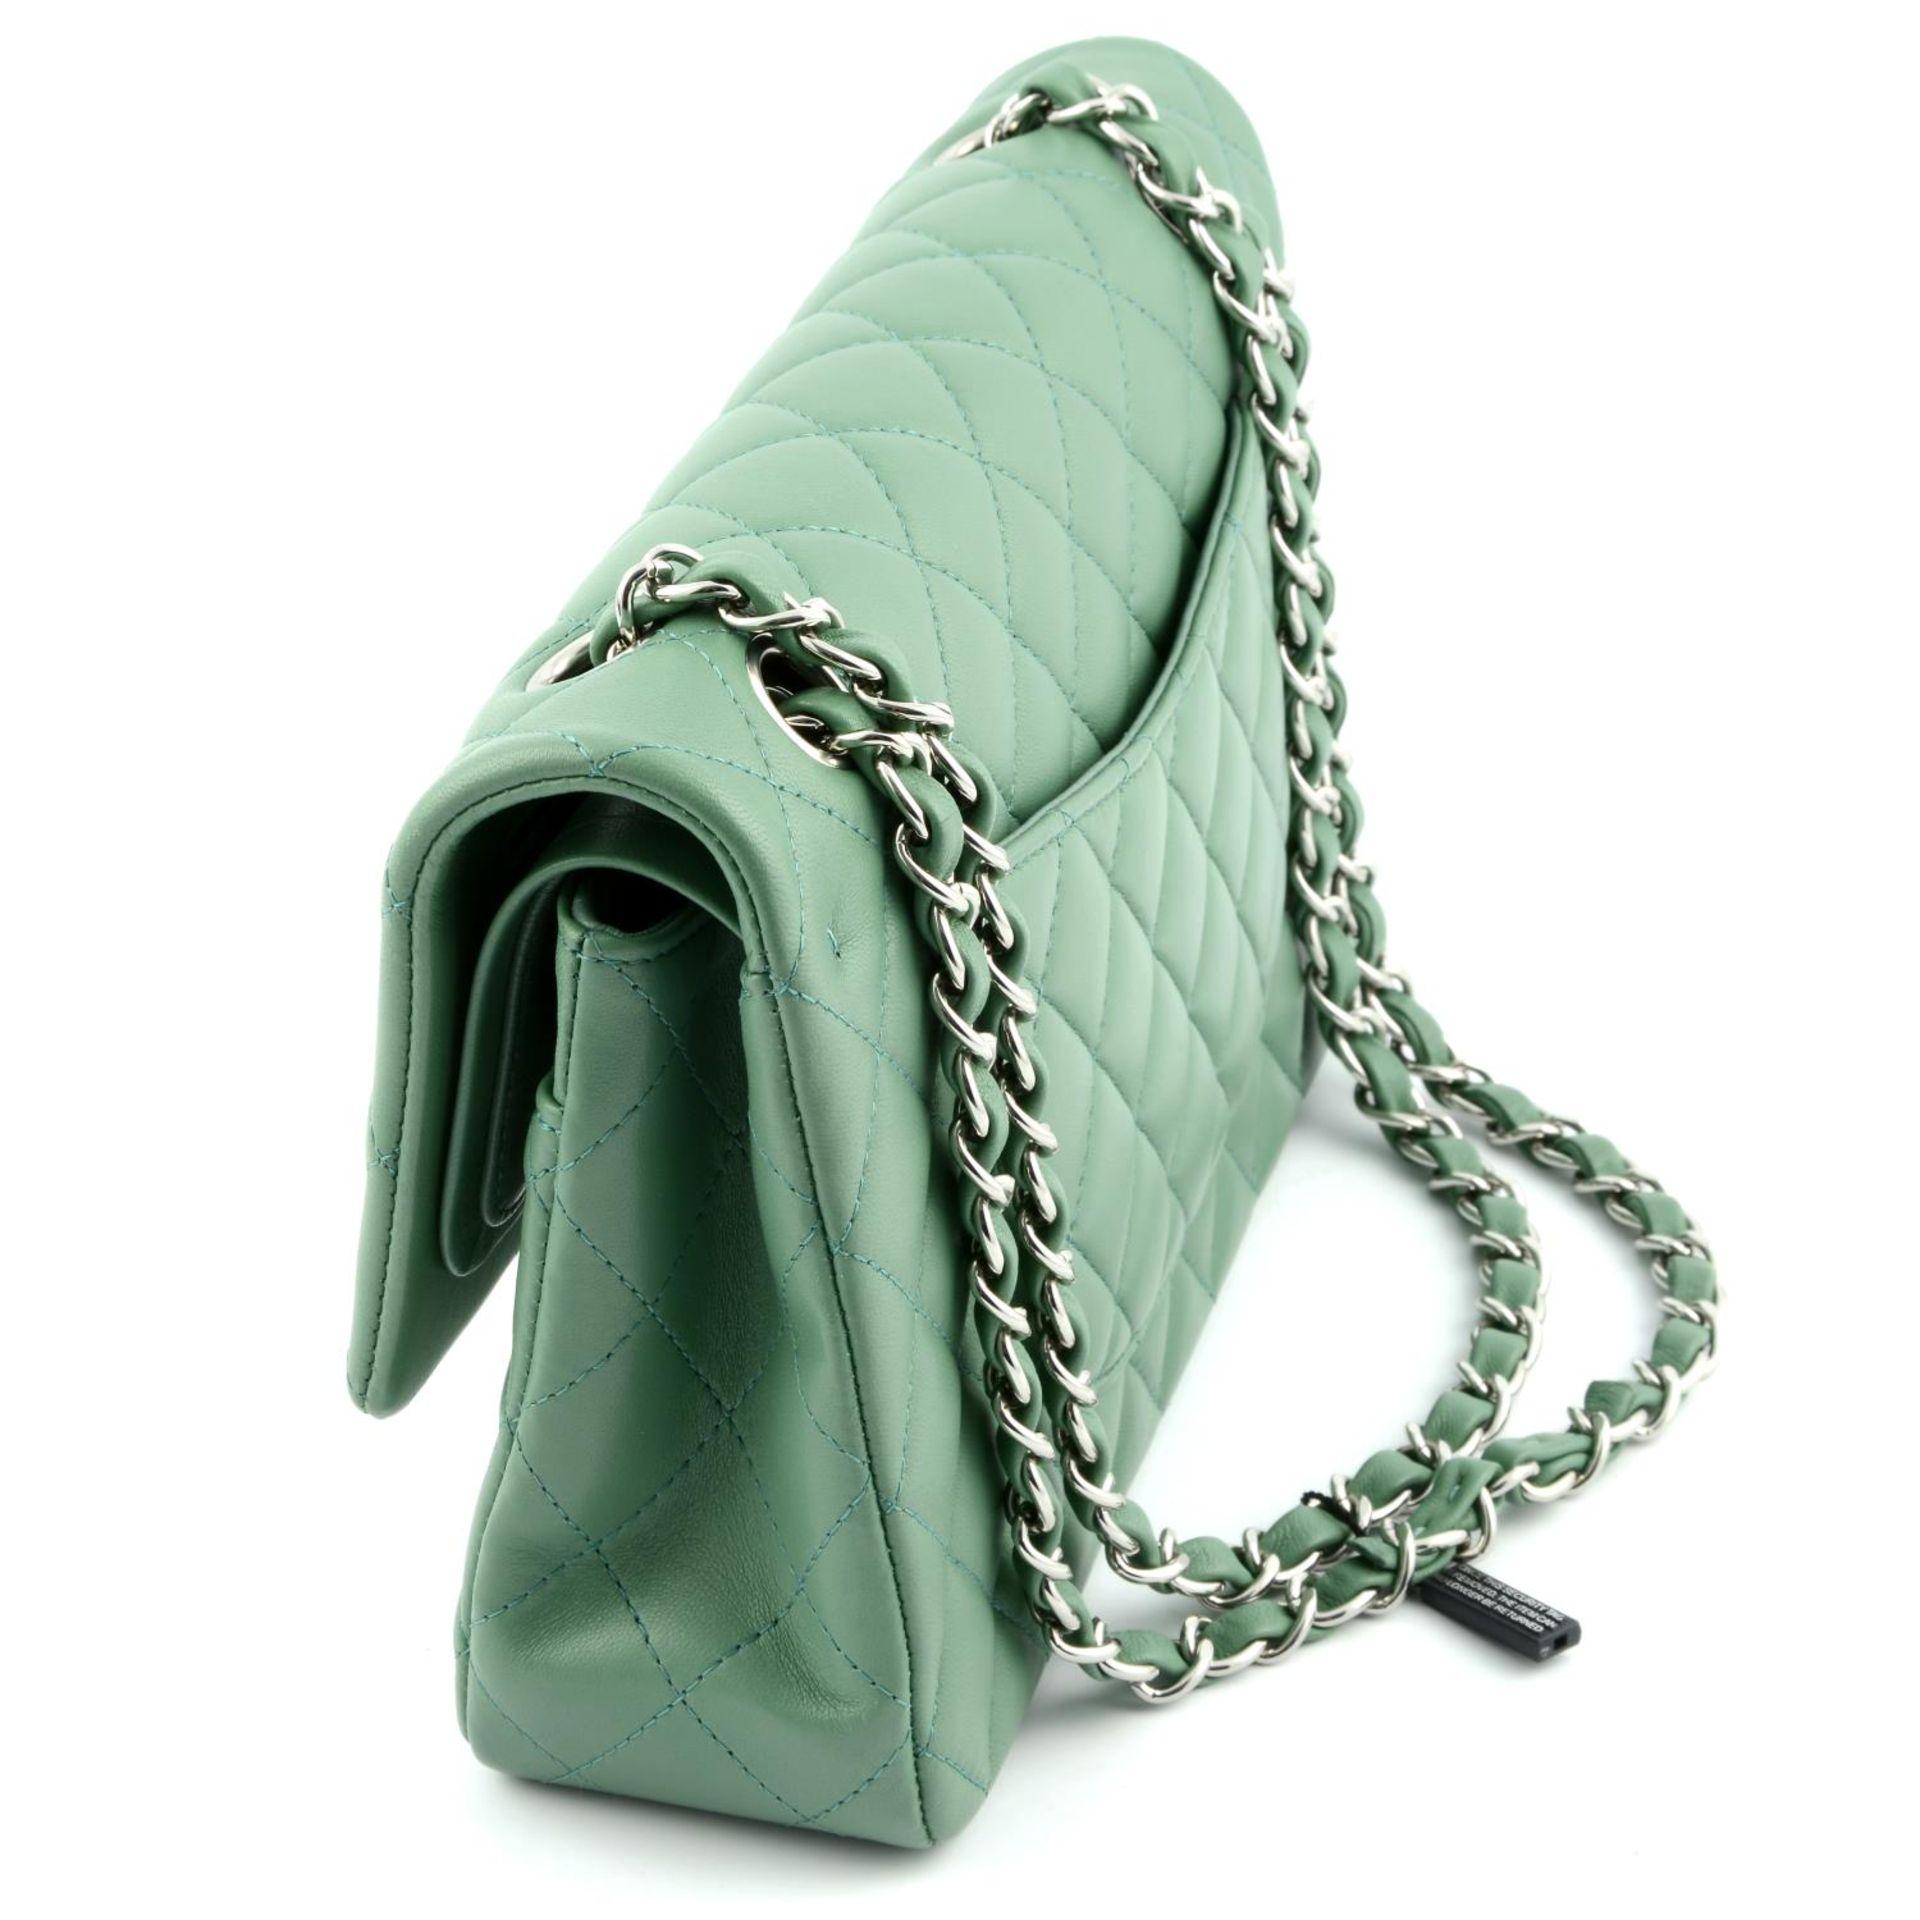 CHANEL - a green medium classic double flap handbag. - Image 3 of 7